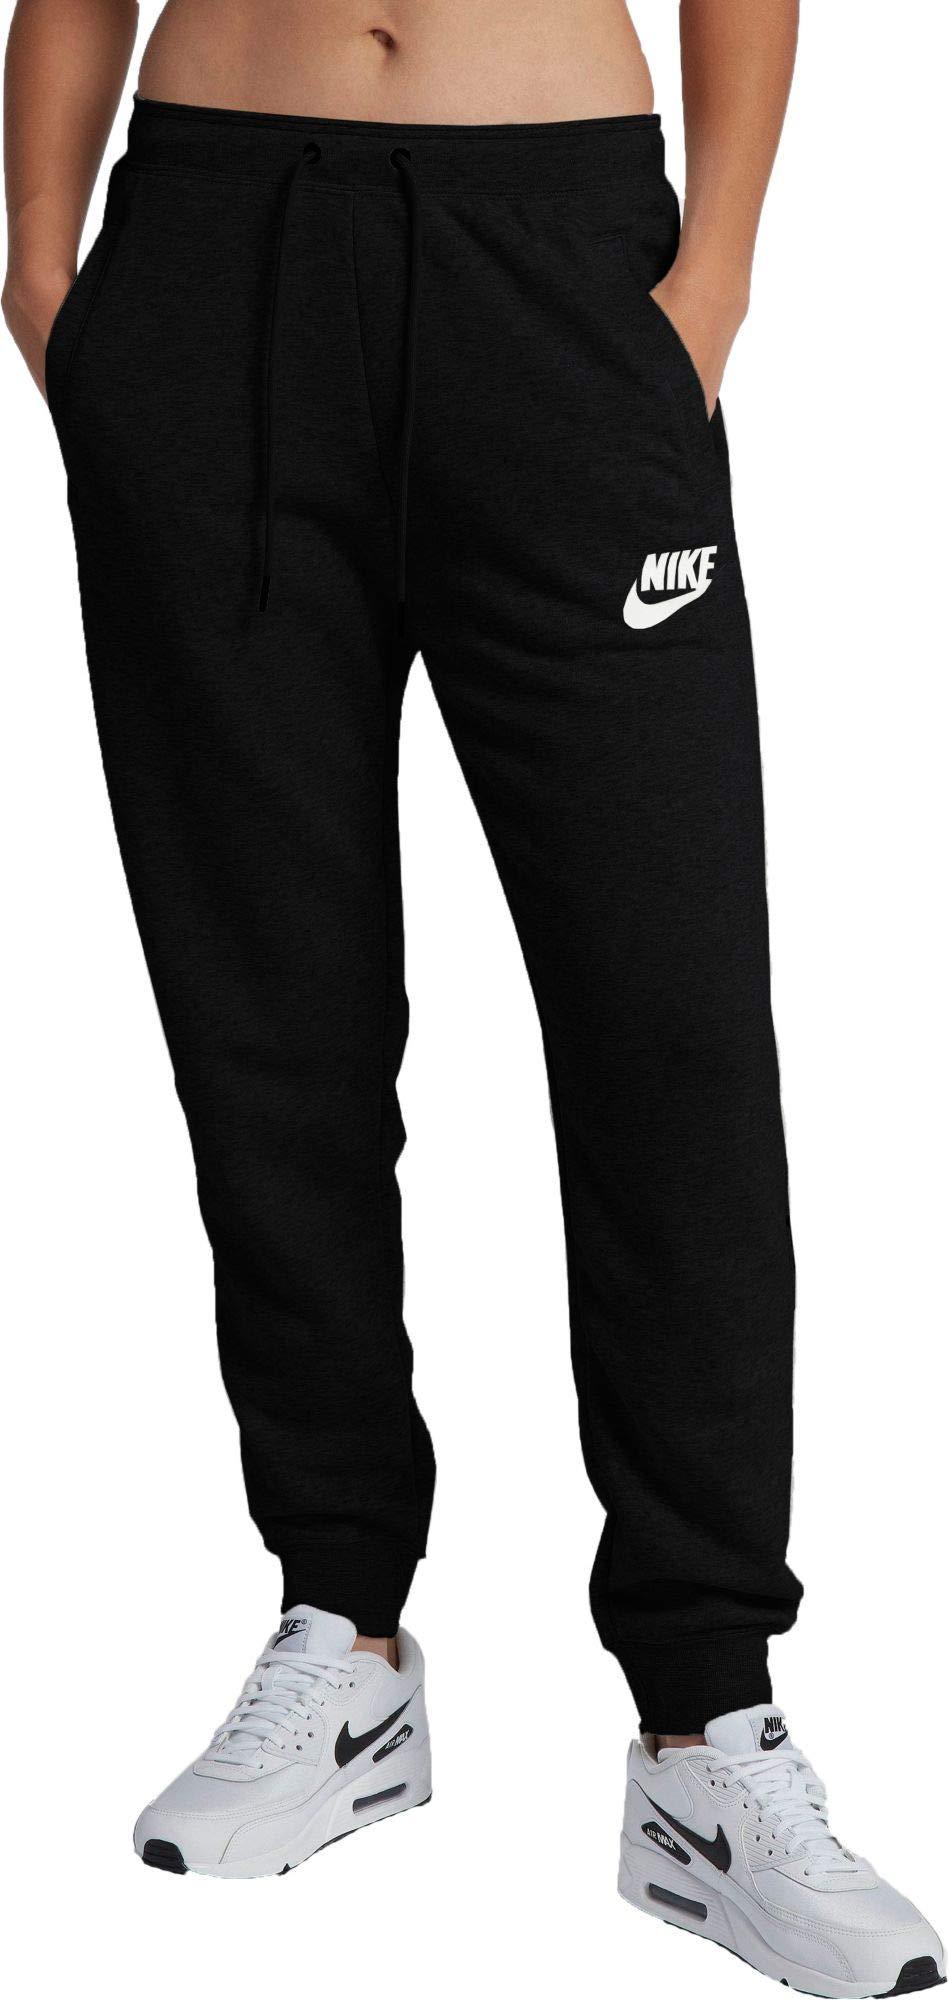 Nike Women's Sportswear Rally Loose Fit Sweatpants (Black Heather/Black, X-Small)